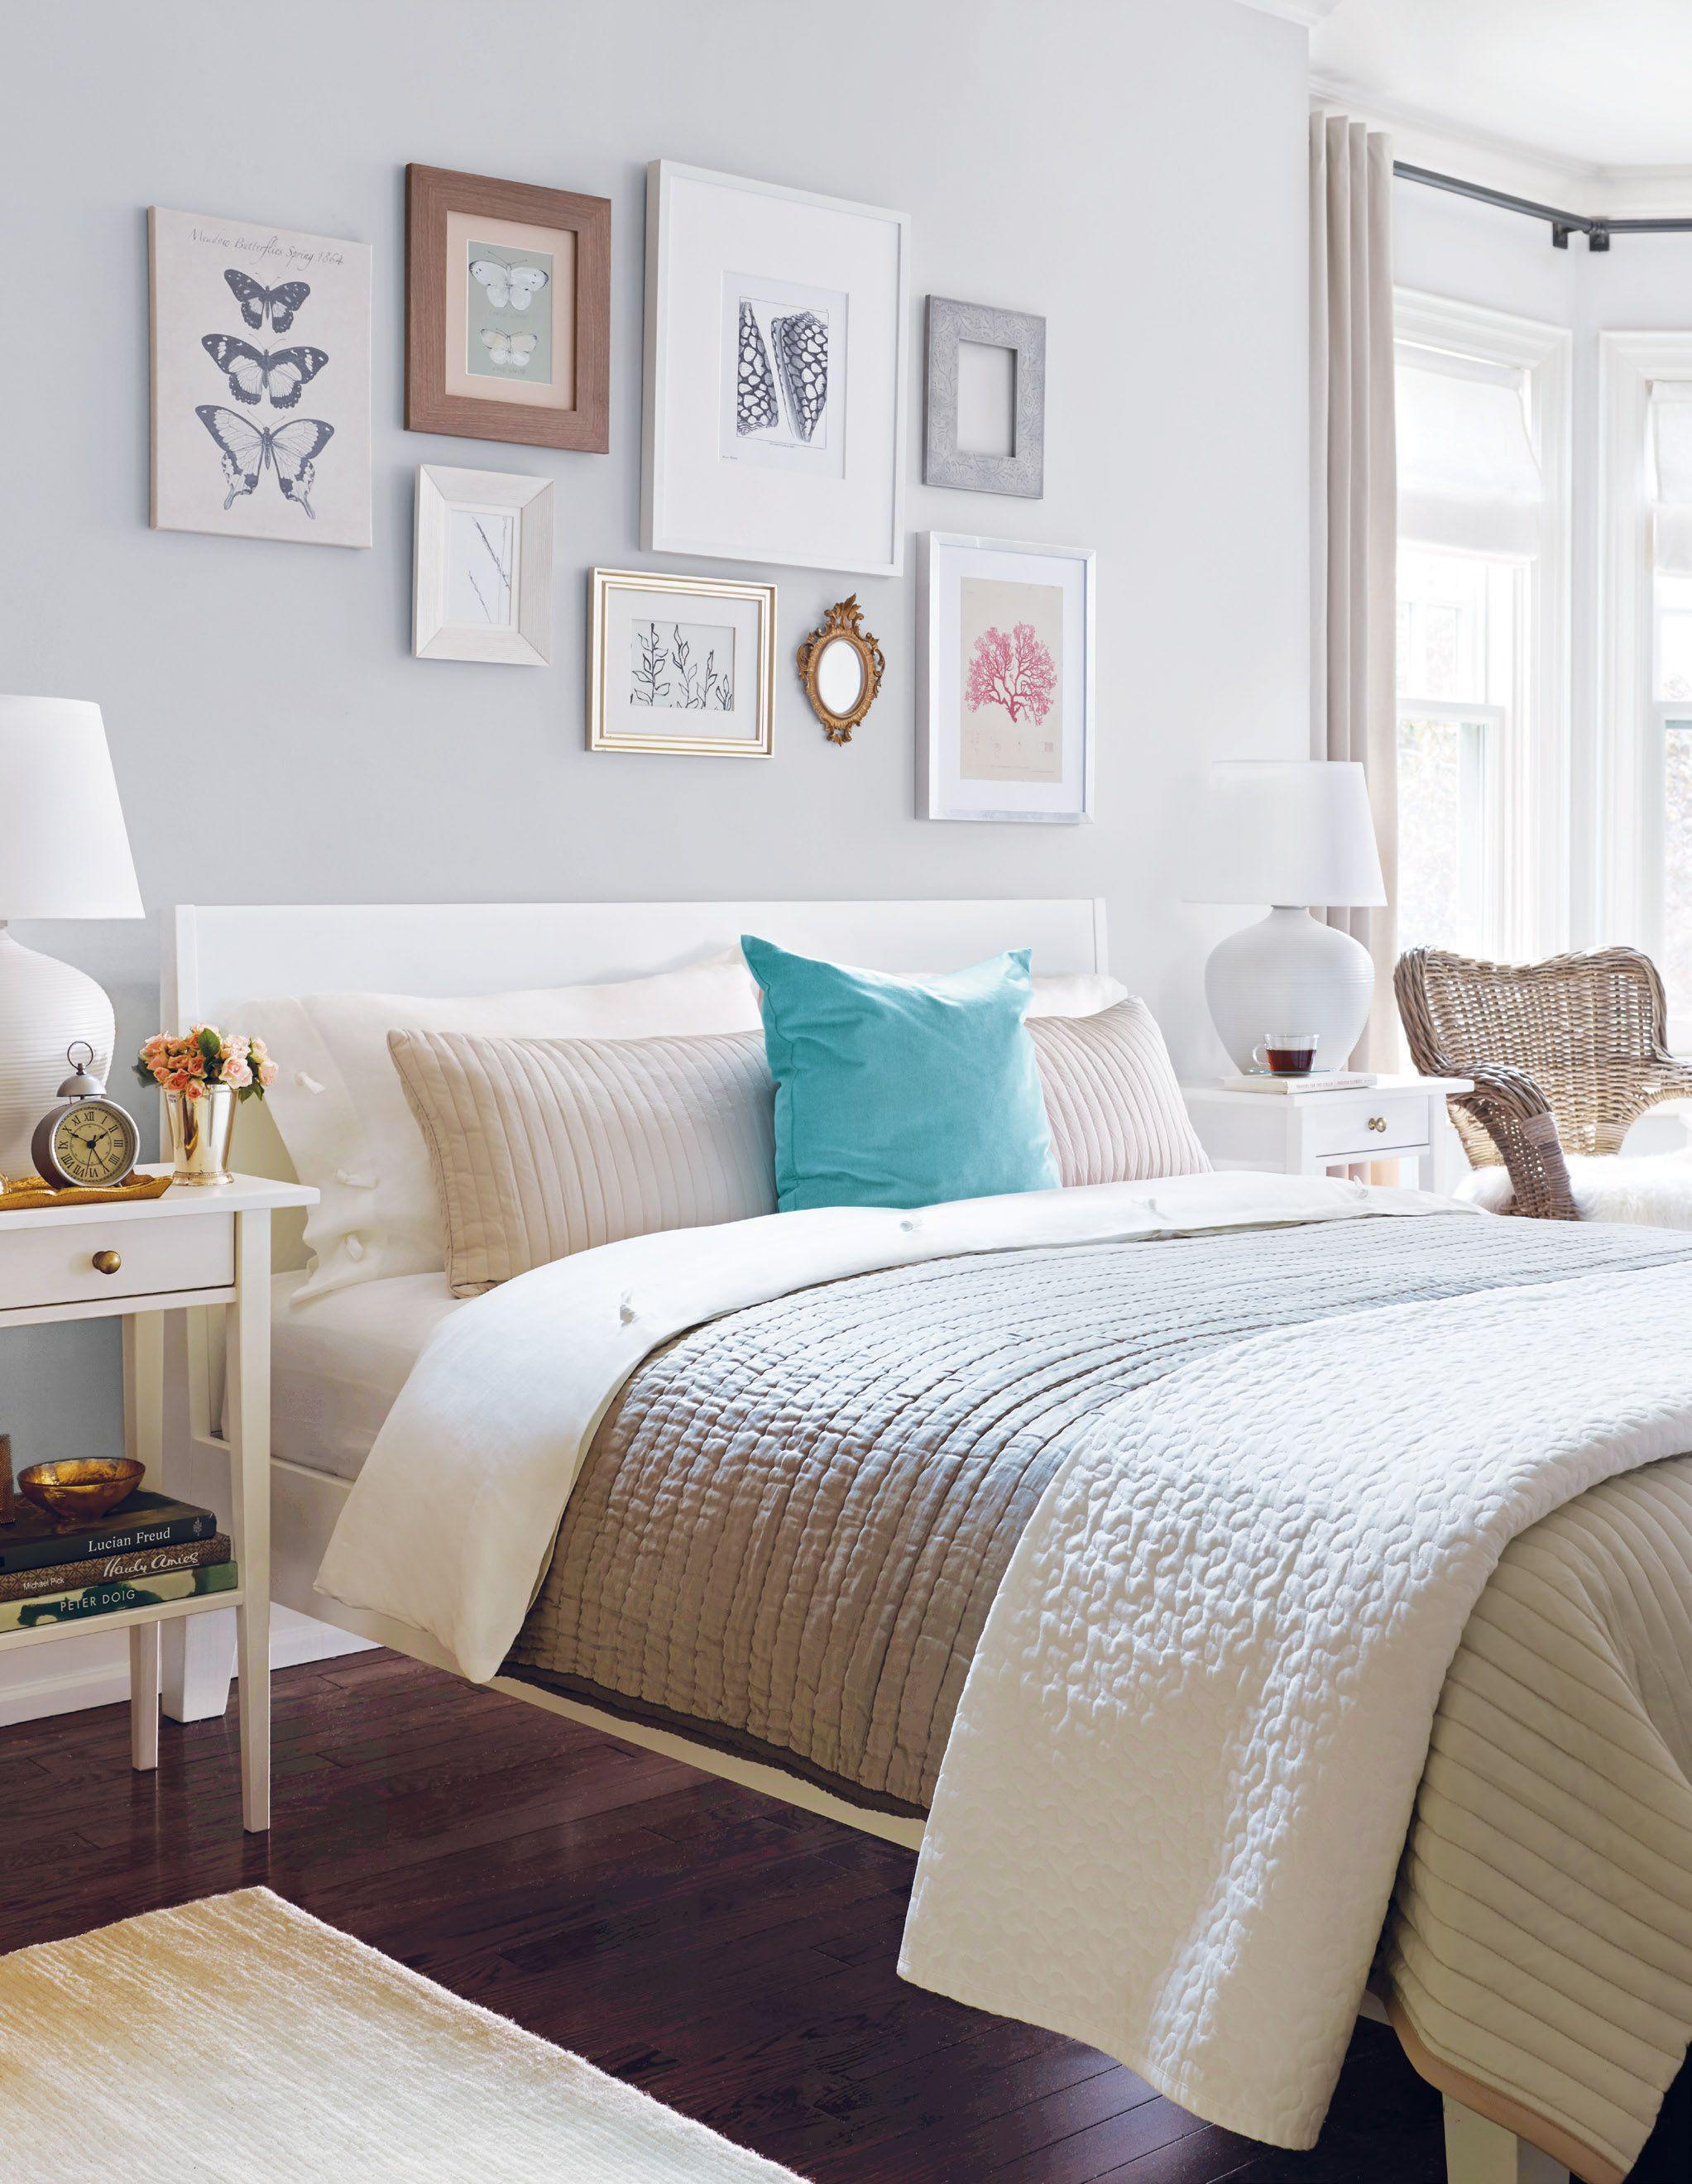 Furniture and Home Furnishings | Ikea bed frames, Ikea ...